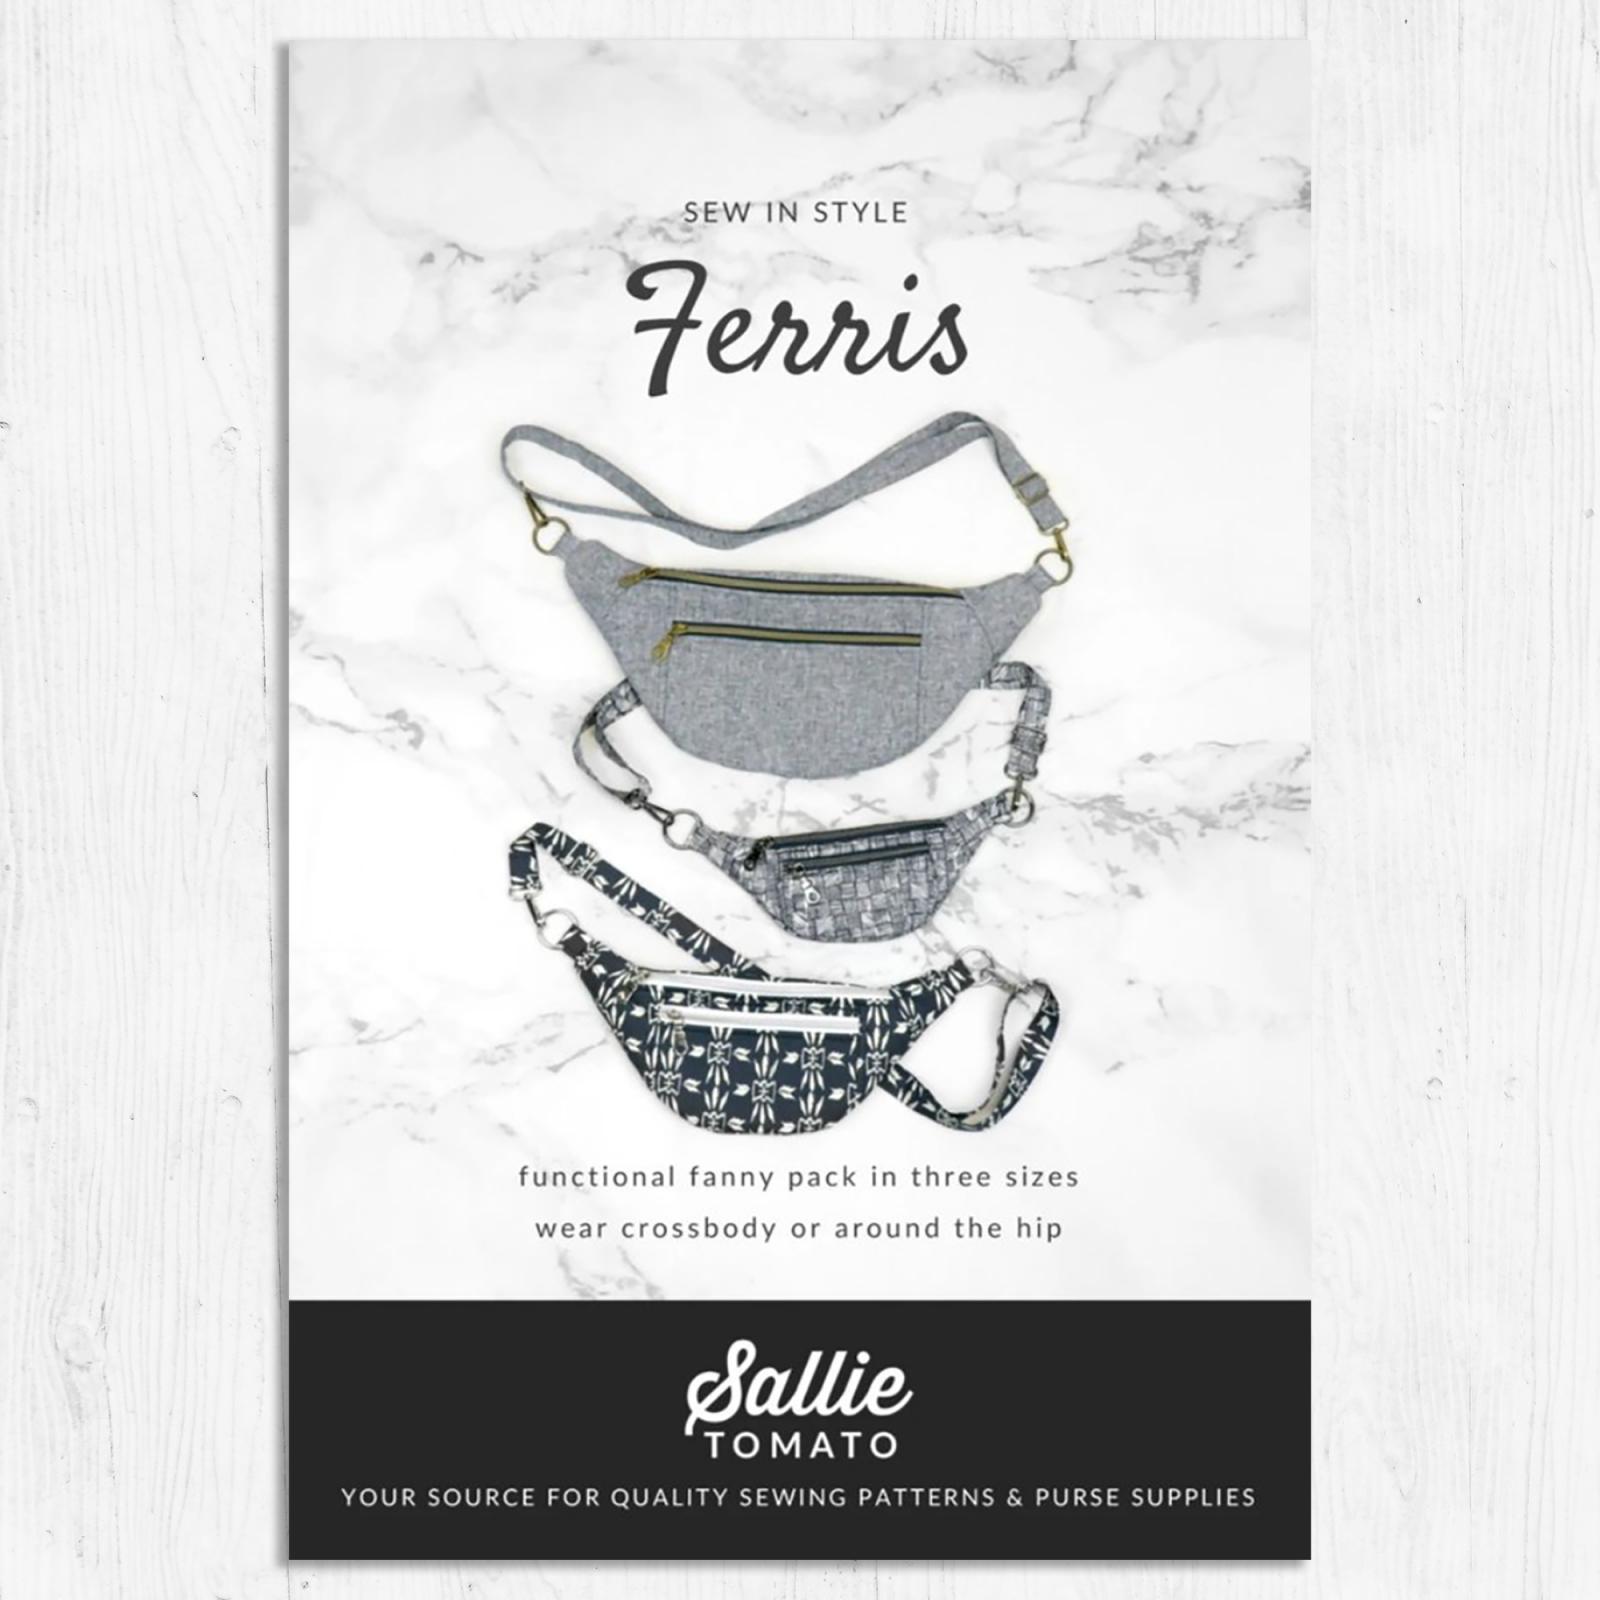 Sallie Tomato - Ferris Bag Pattern